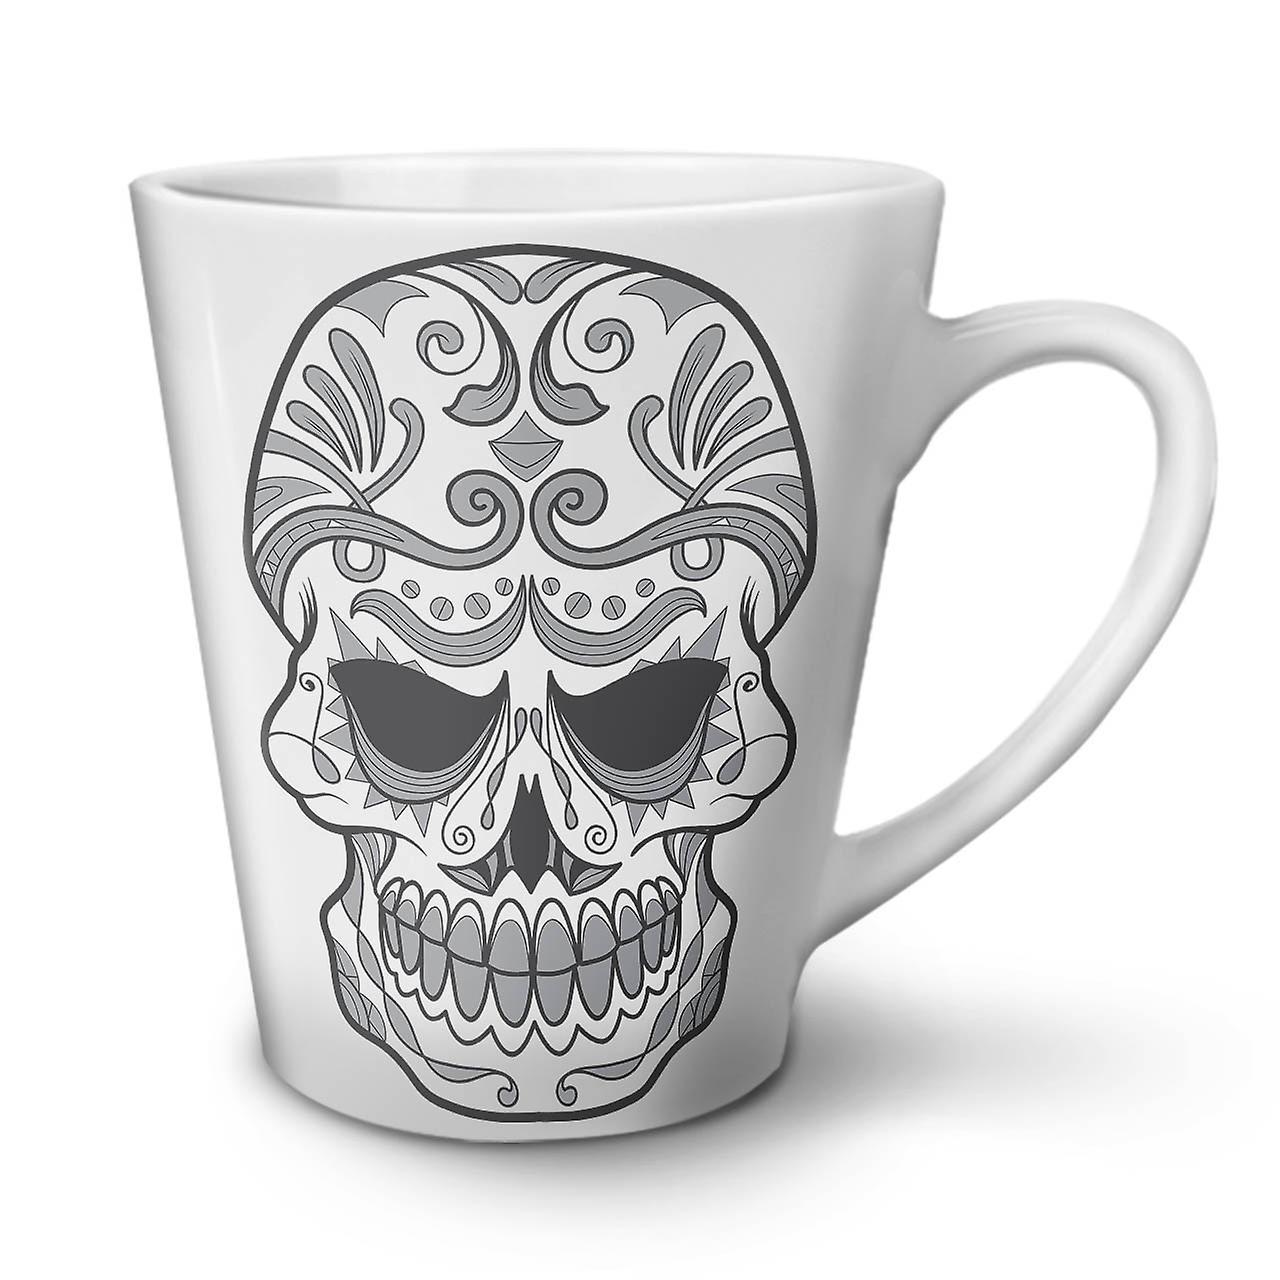 Mug Ceramic White Latte Katana New Tea 12 OzWellcoda Coffee Cool f6yvgYb7